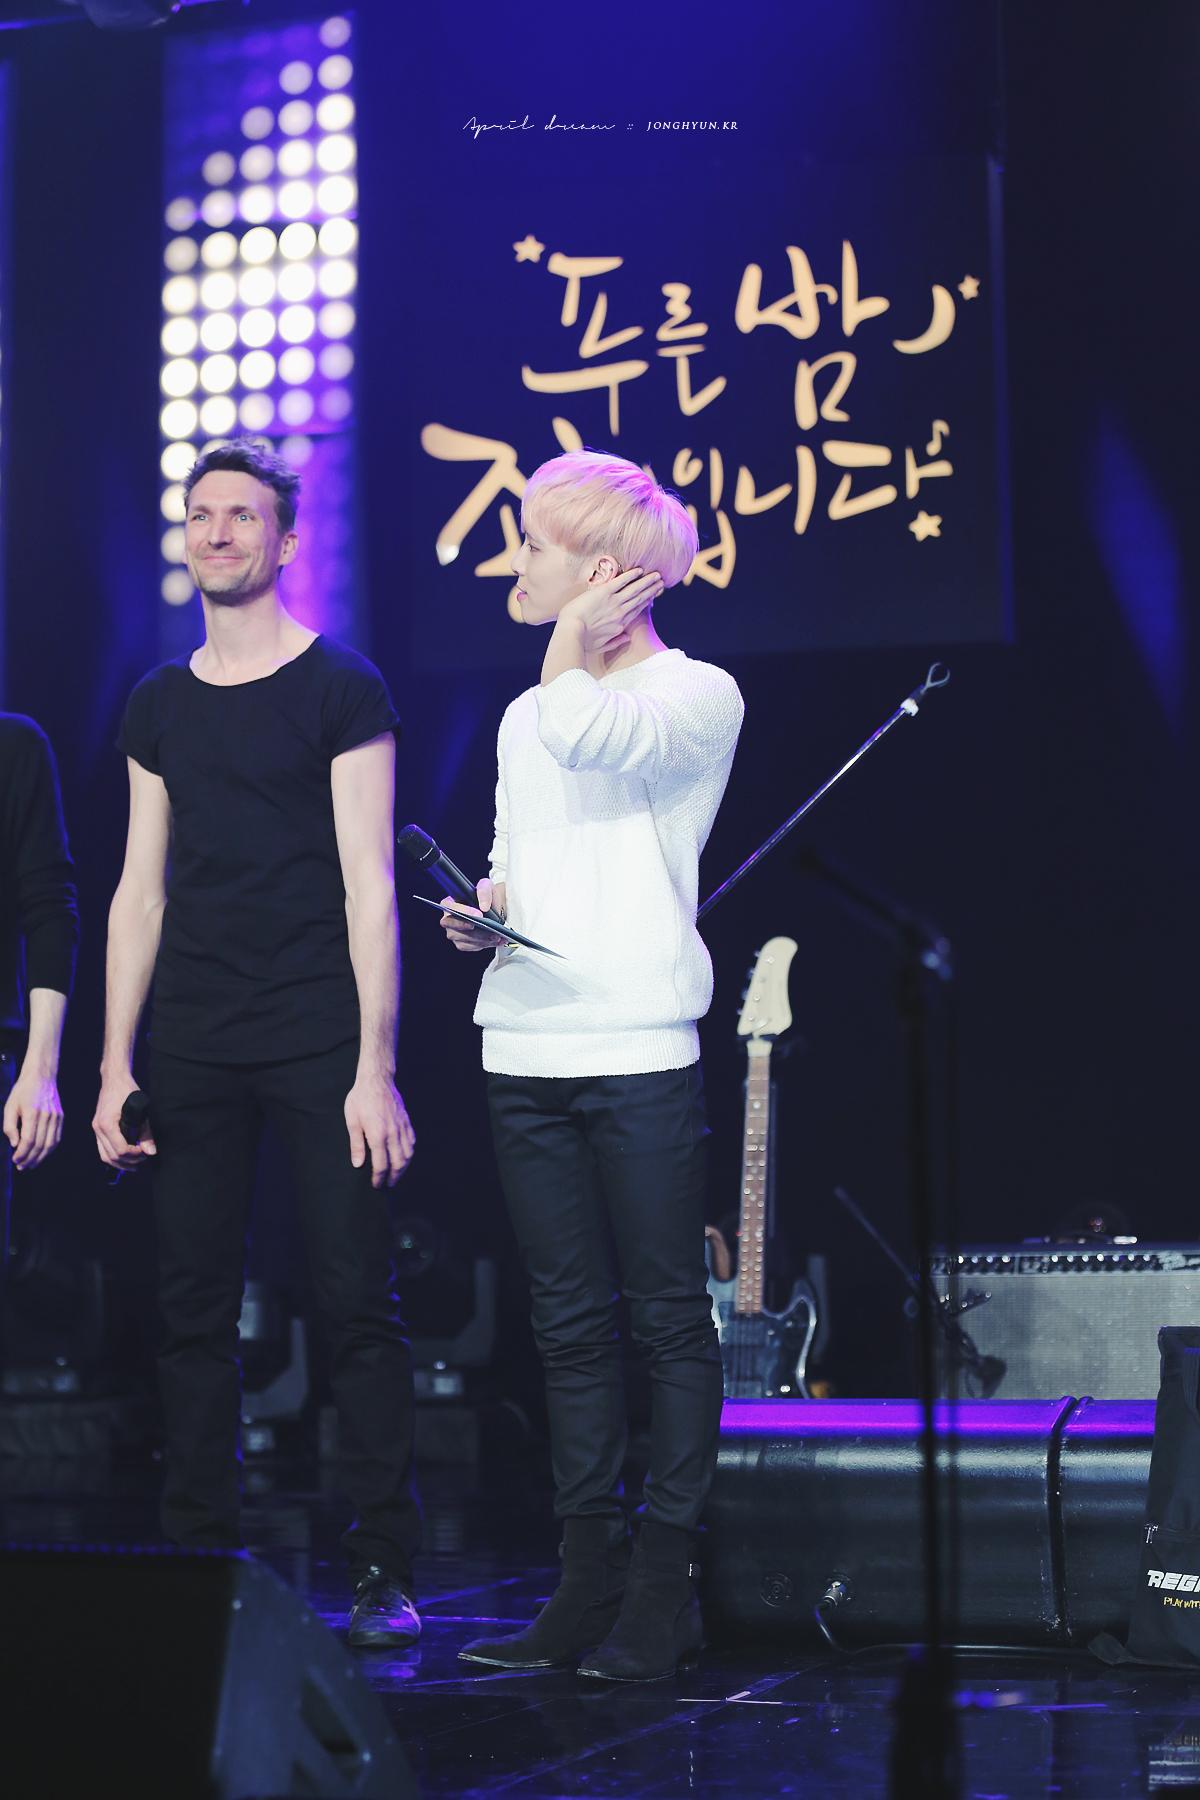 160426 Jonghyun @ MBC Live Concert - Blue Night 26566041082_d79e005424_o